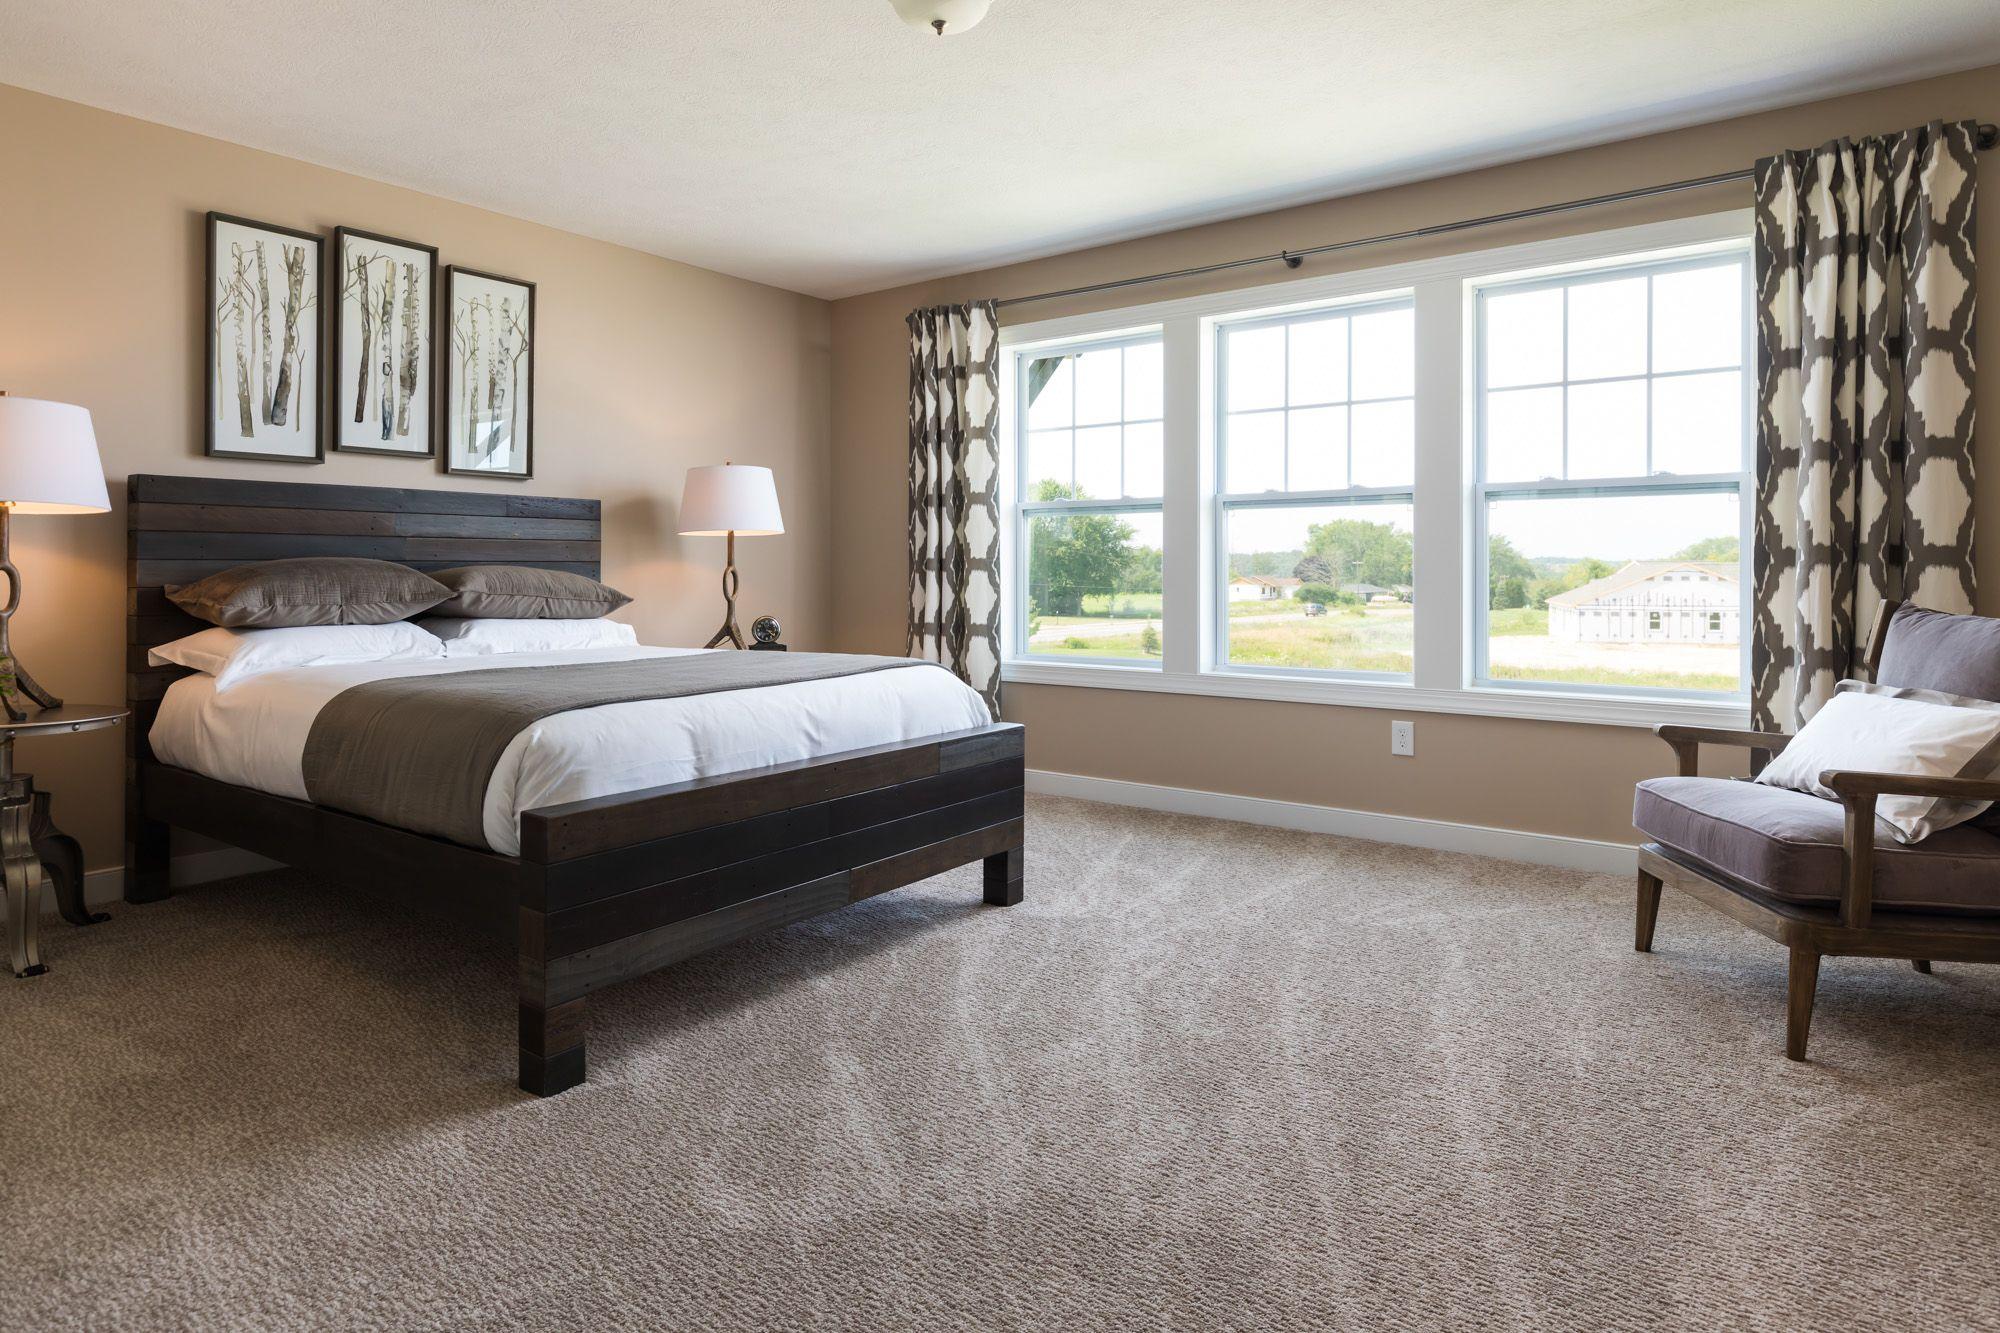 Bedroom featured in the Elements 2600 By Allen Edwin Homes in Detroit, MI